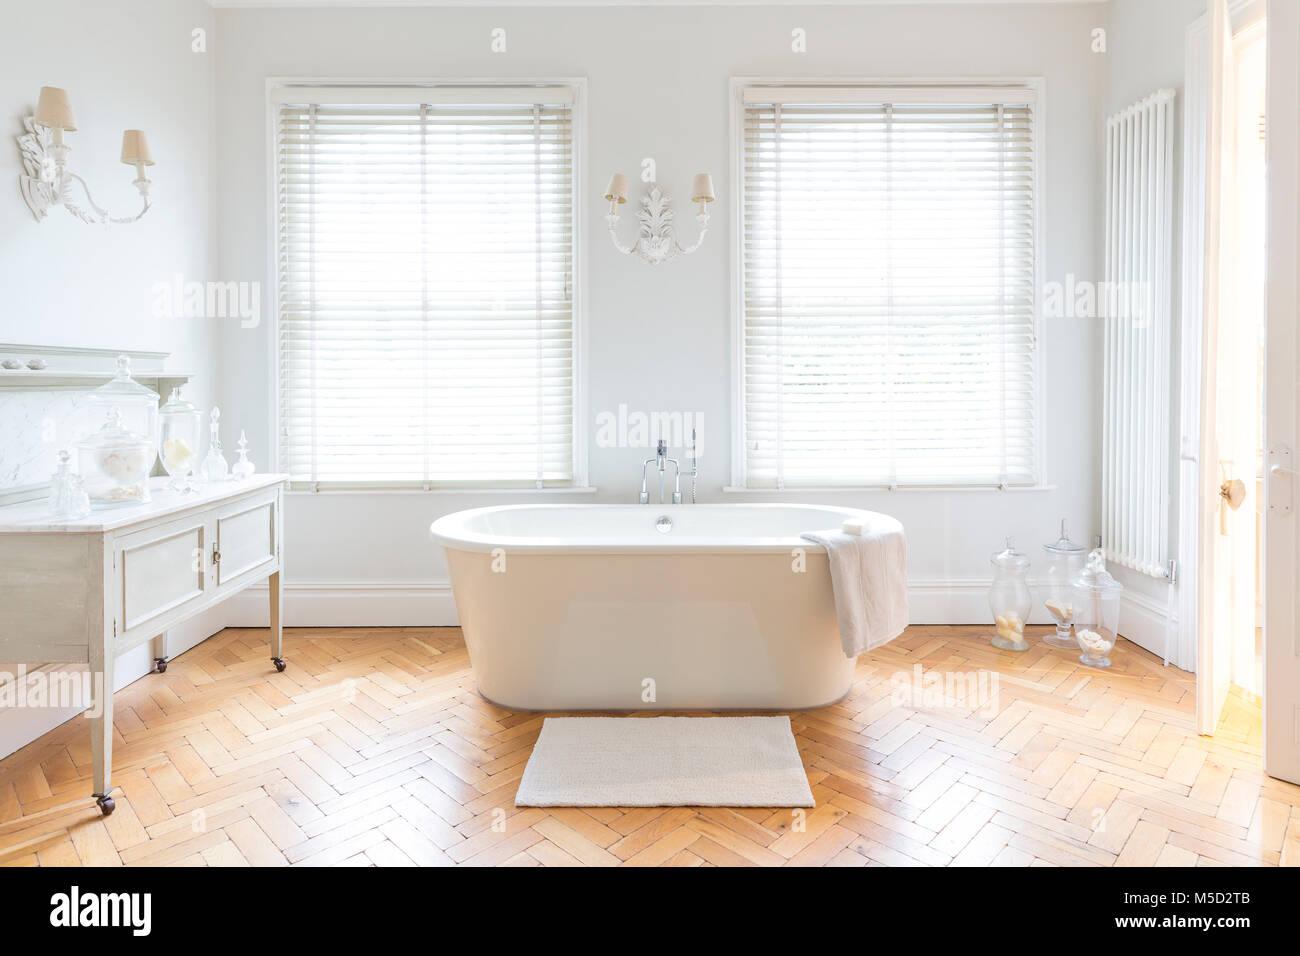 White, luxury home showcase bathroom with soaking tub and parquet ...